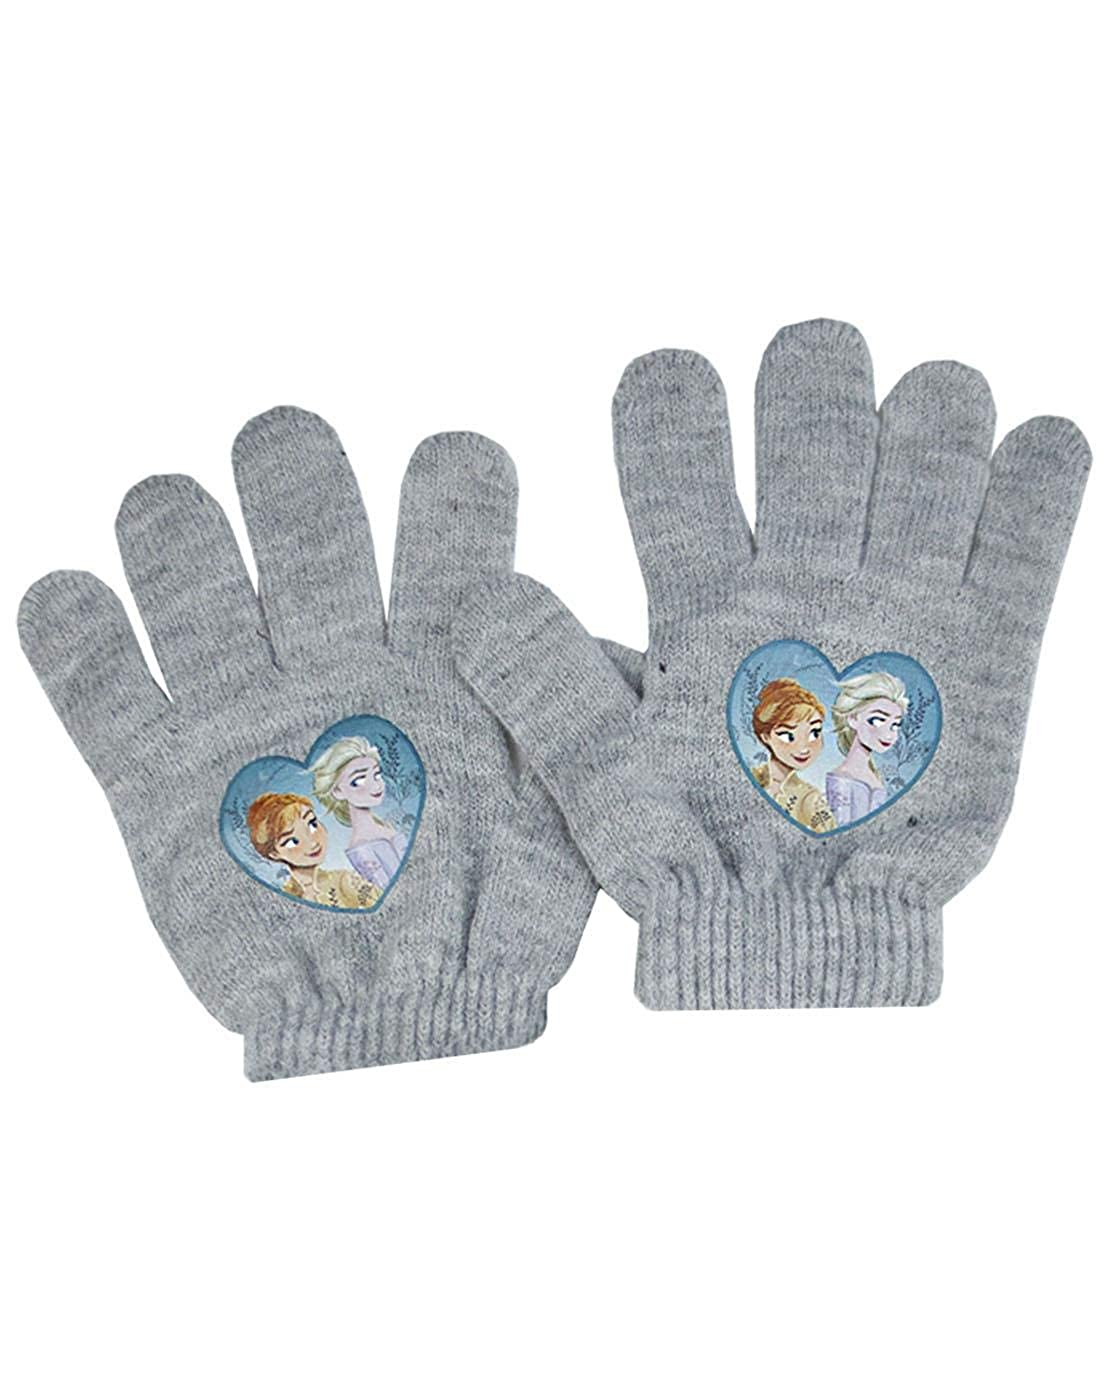 Disney Frozen 2 Elsa And Anna Faux Fur Bobble Hat And Glove Girls Set